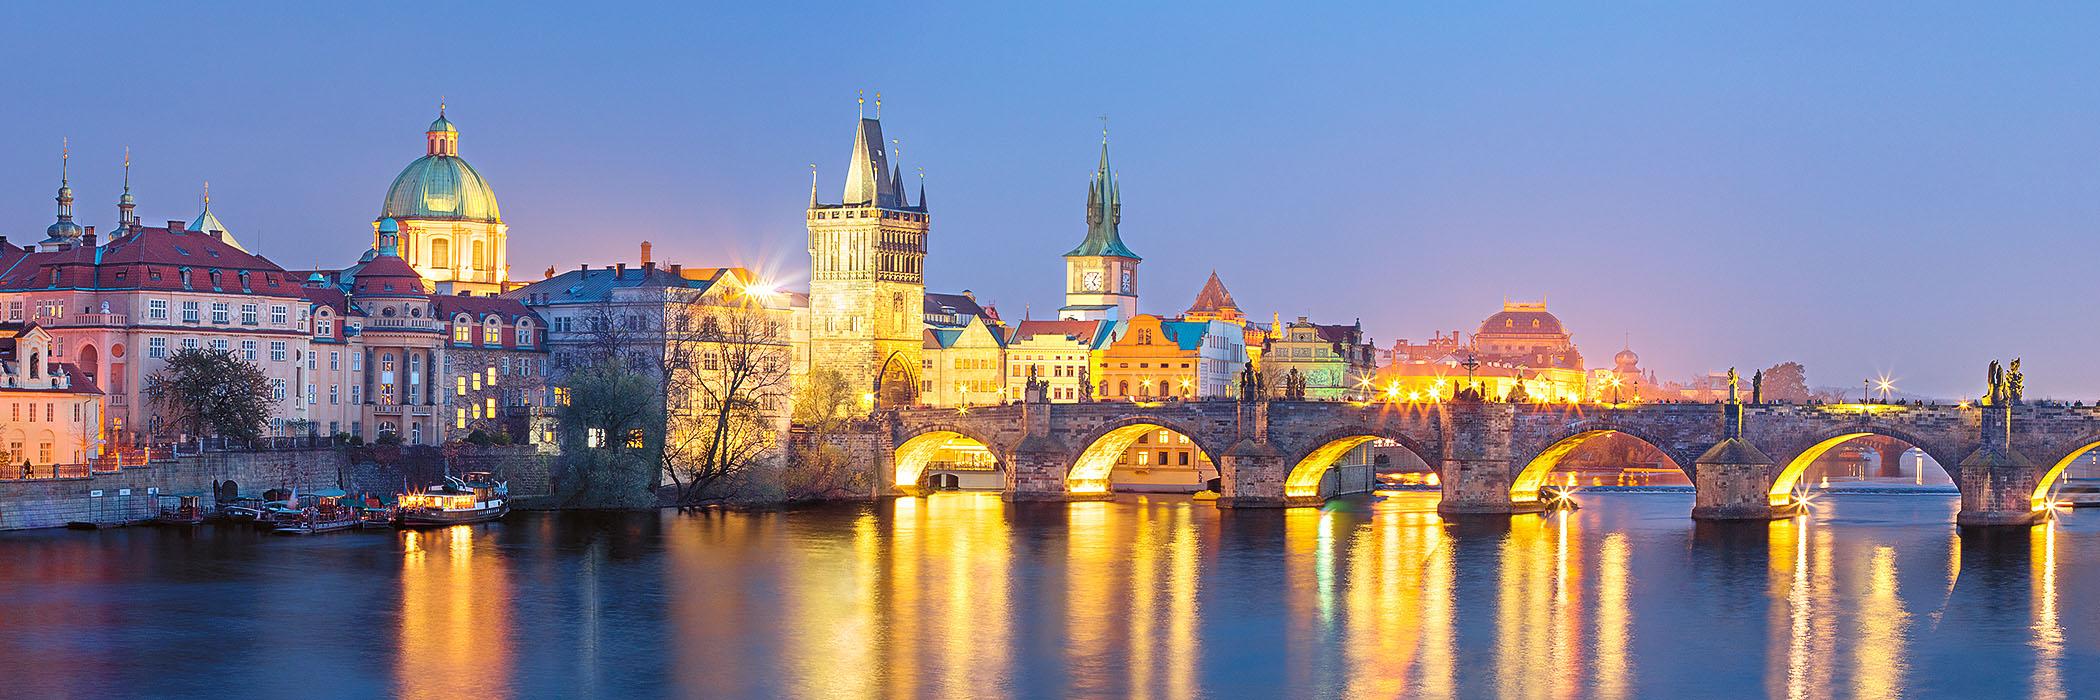 "ECR-P0001 ""Charles Bridge, Prague, Czech Republic"""